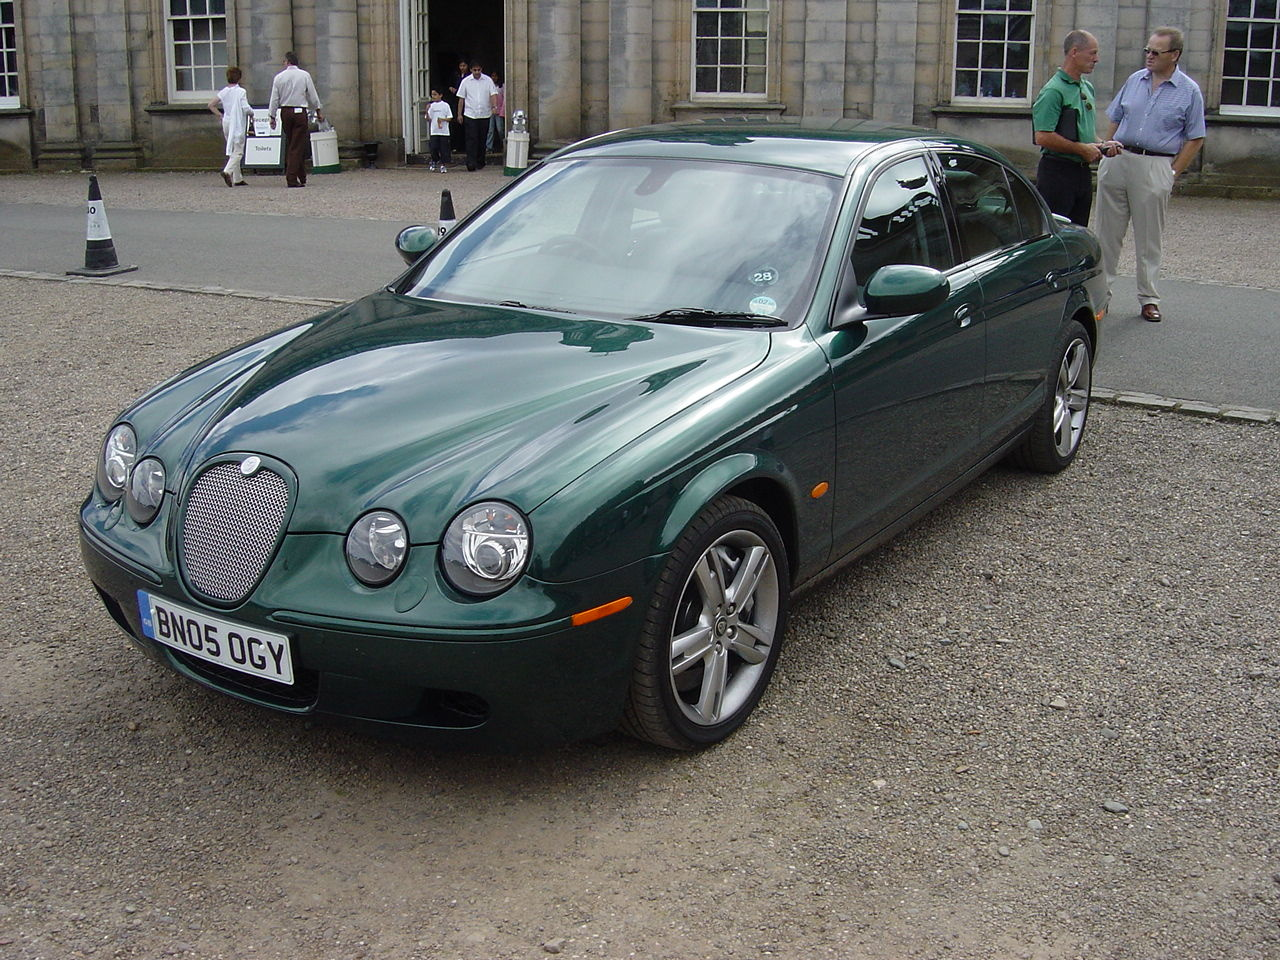 2005 Jaguar S-TYPE R - Overview - CarGurus